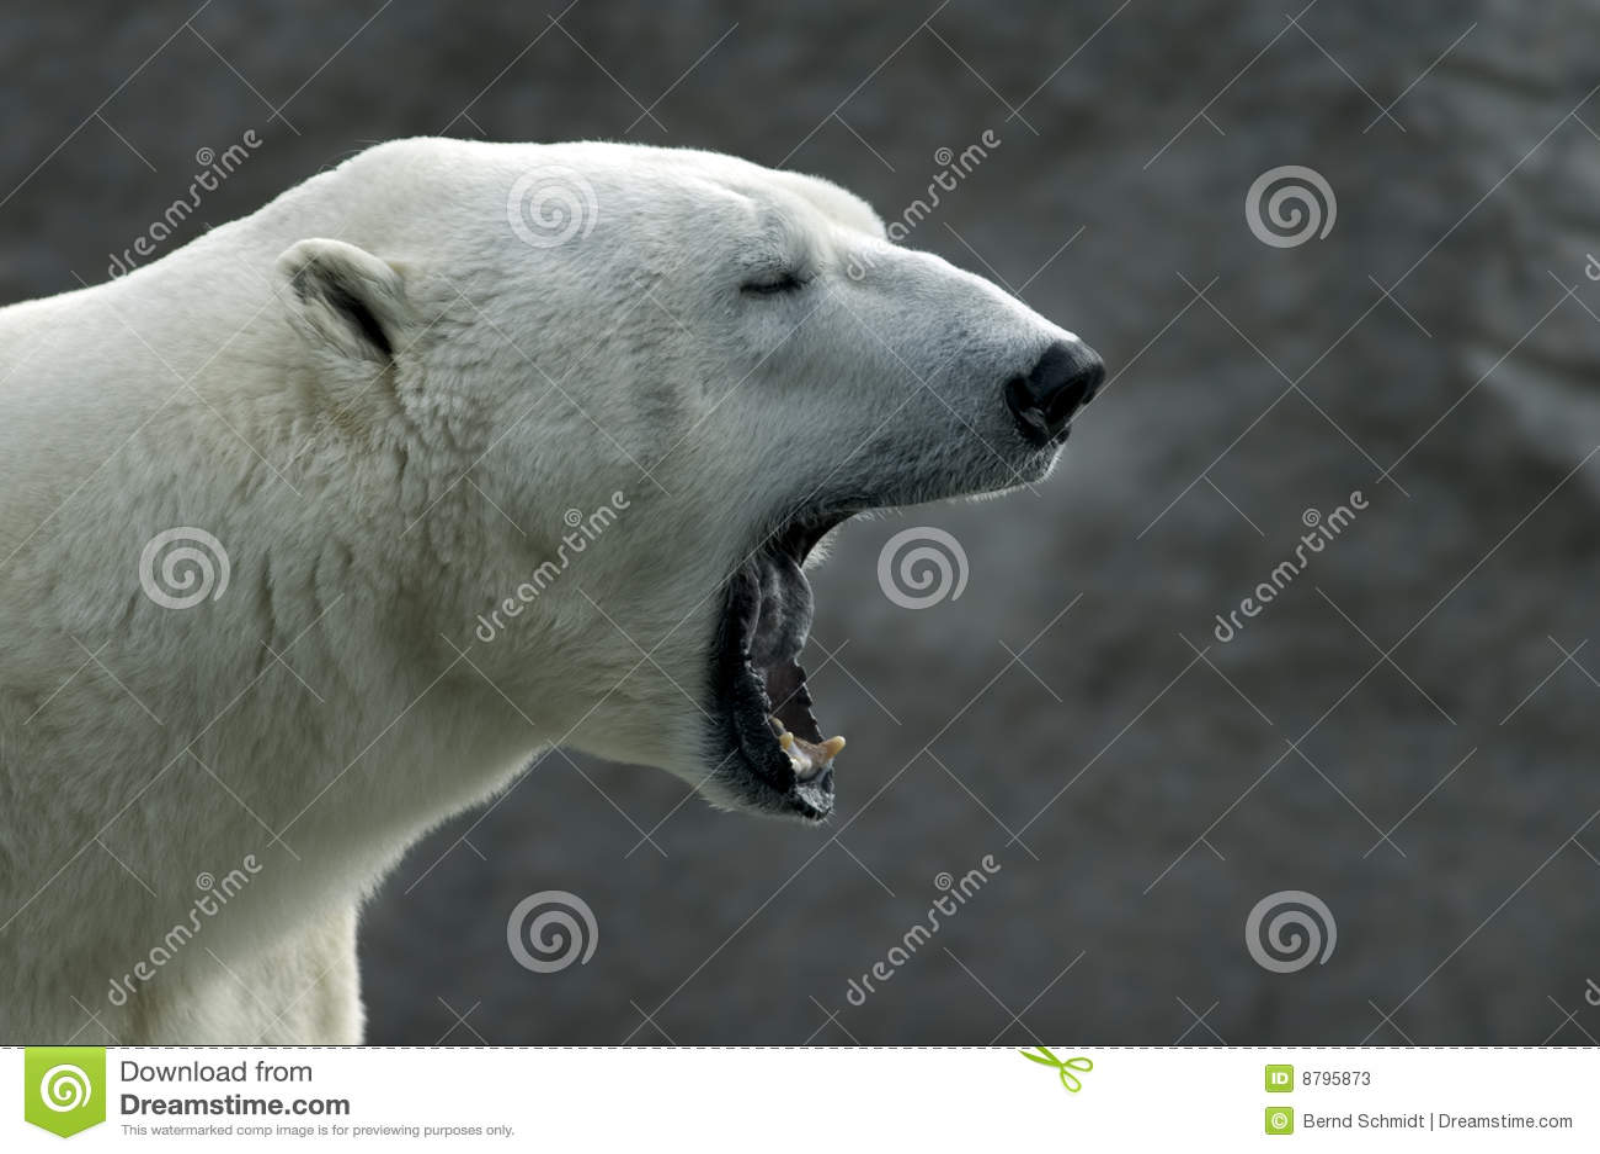 Roaring Polar Bear Ursus Maritimus Stock Image Image